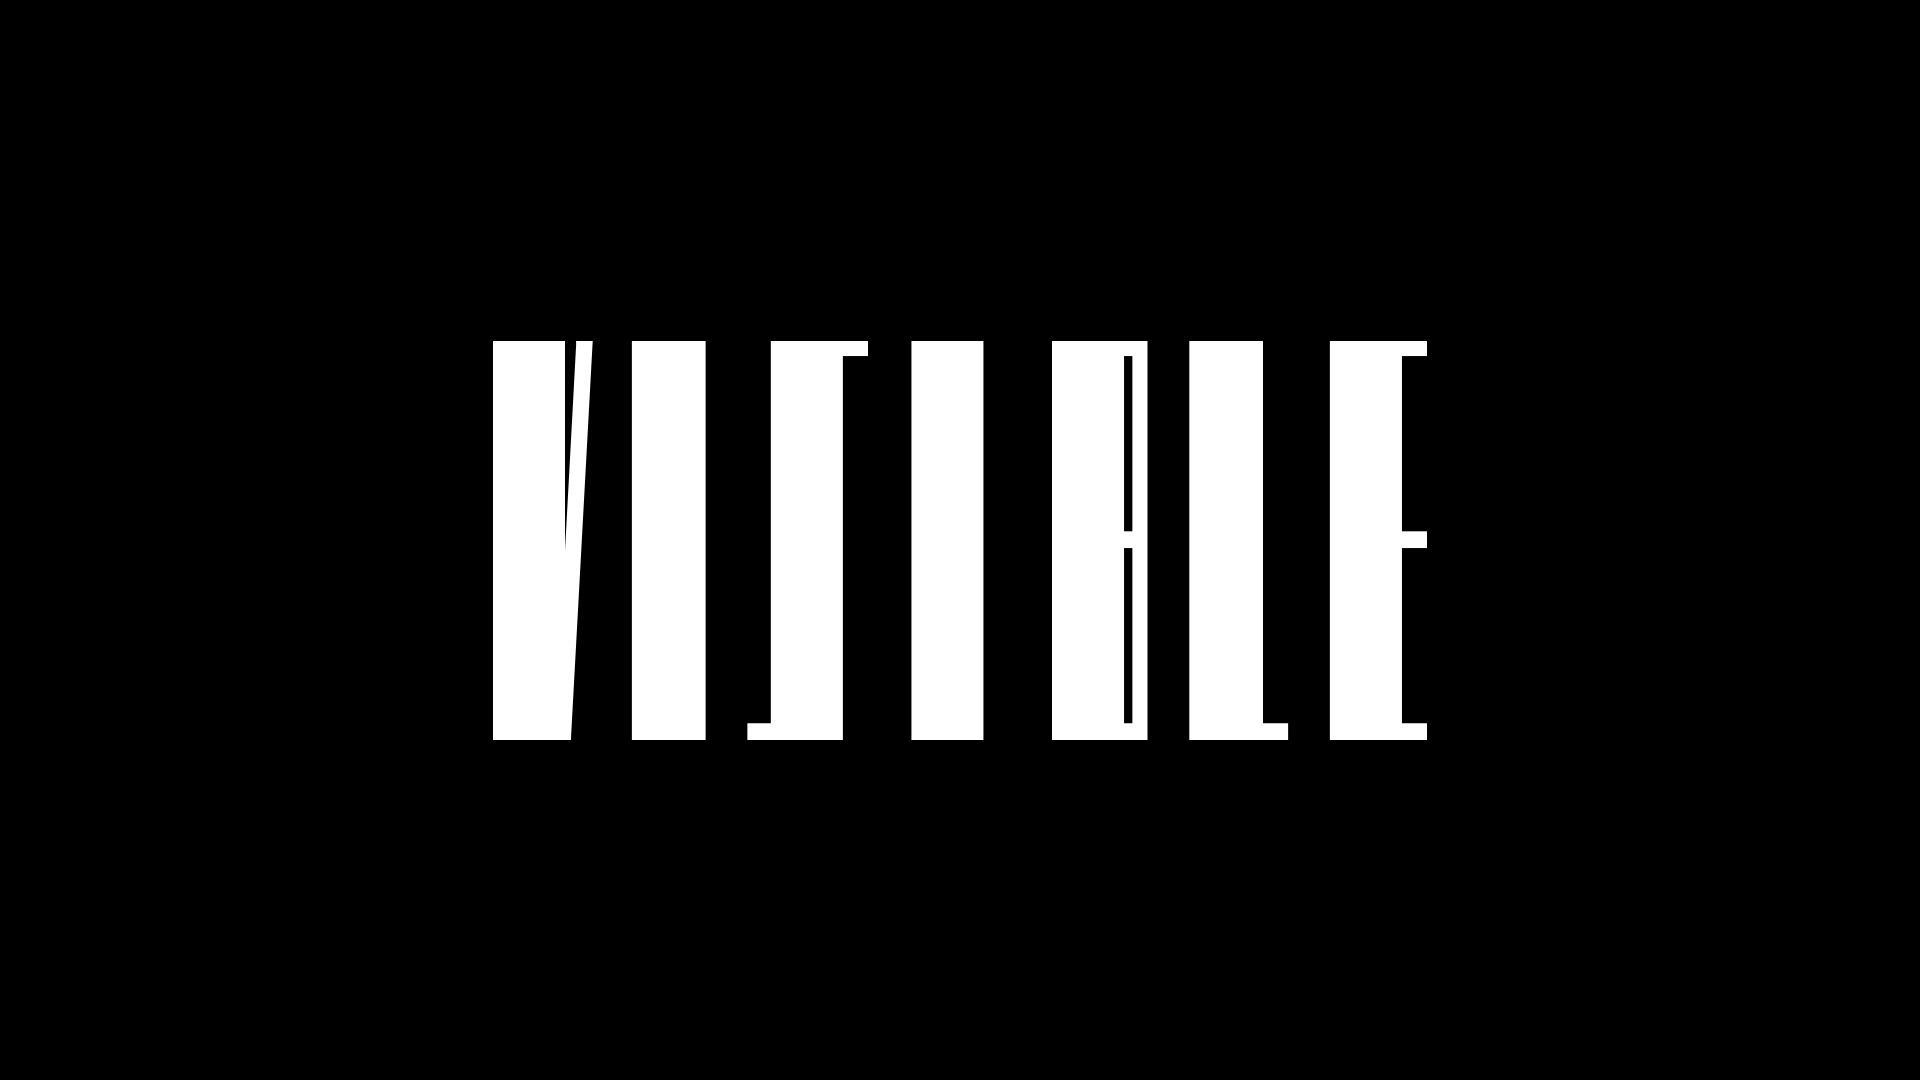 03_florian_branchet_designer_graphique_visible_logo2